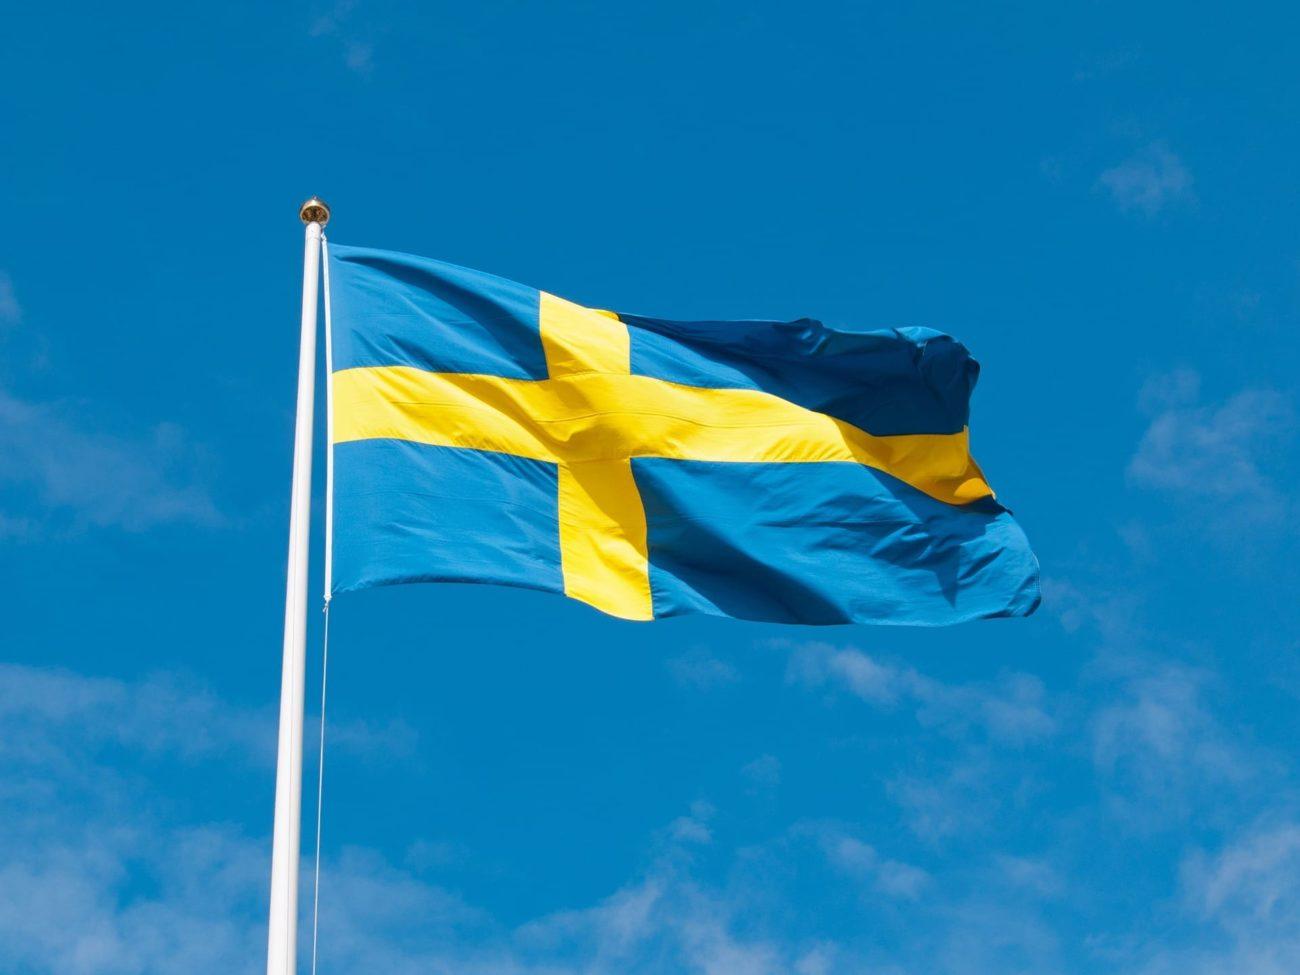 Svenska Spel records Q2 revenue increase